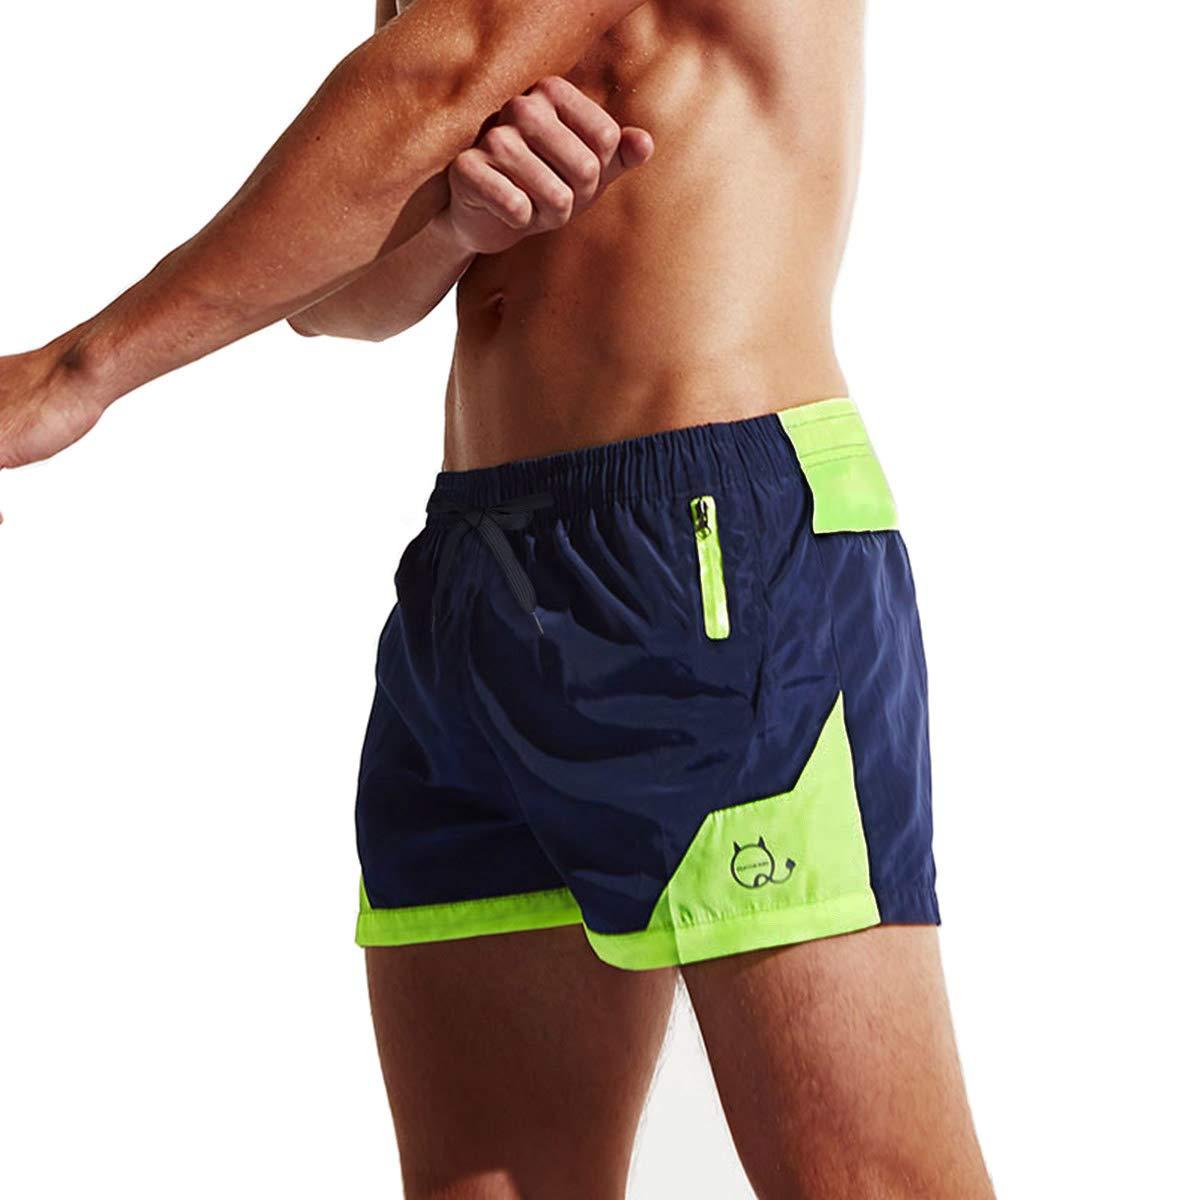 Lachi Mens Swimming Shorts Trunks Quick Dry Mesh Lining Aquashorts Beach Shorts with Pockets for Swim Bathing Serf